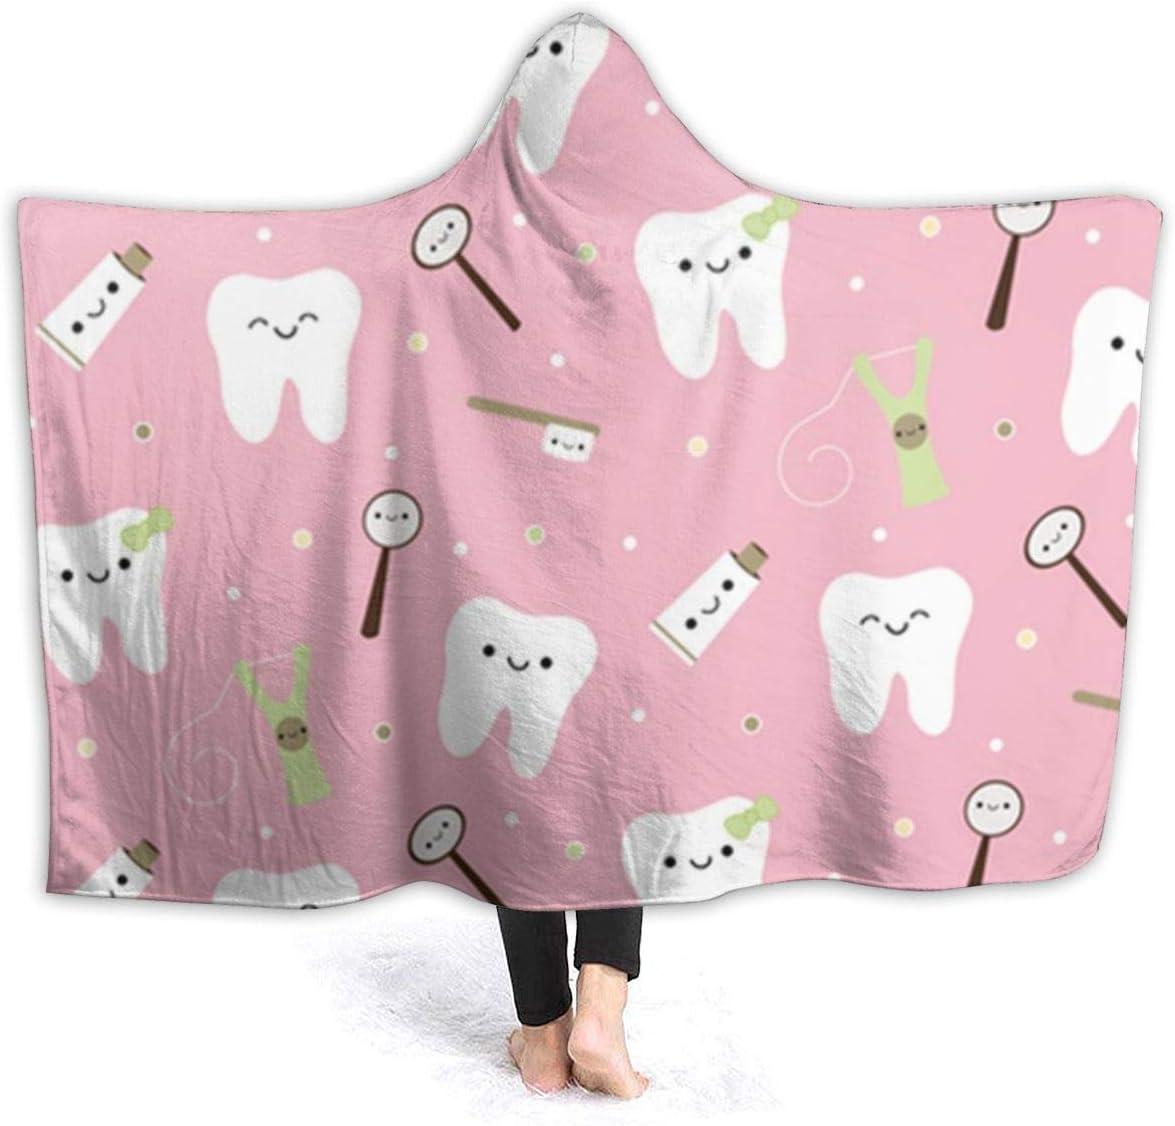 NiYoung Men Women Novelty Hooded Blanket Super Soft Warm Flannel Fleece Wearable Hoodie Blanket Throw for Home Office School Travel 50x40 Cute Funny Llama Rainbow Alpaca